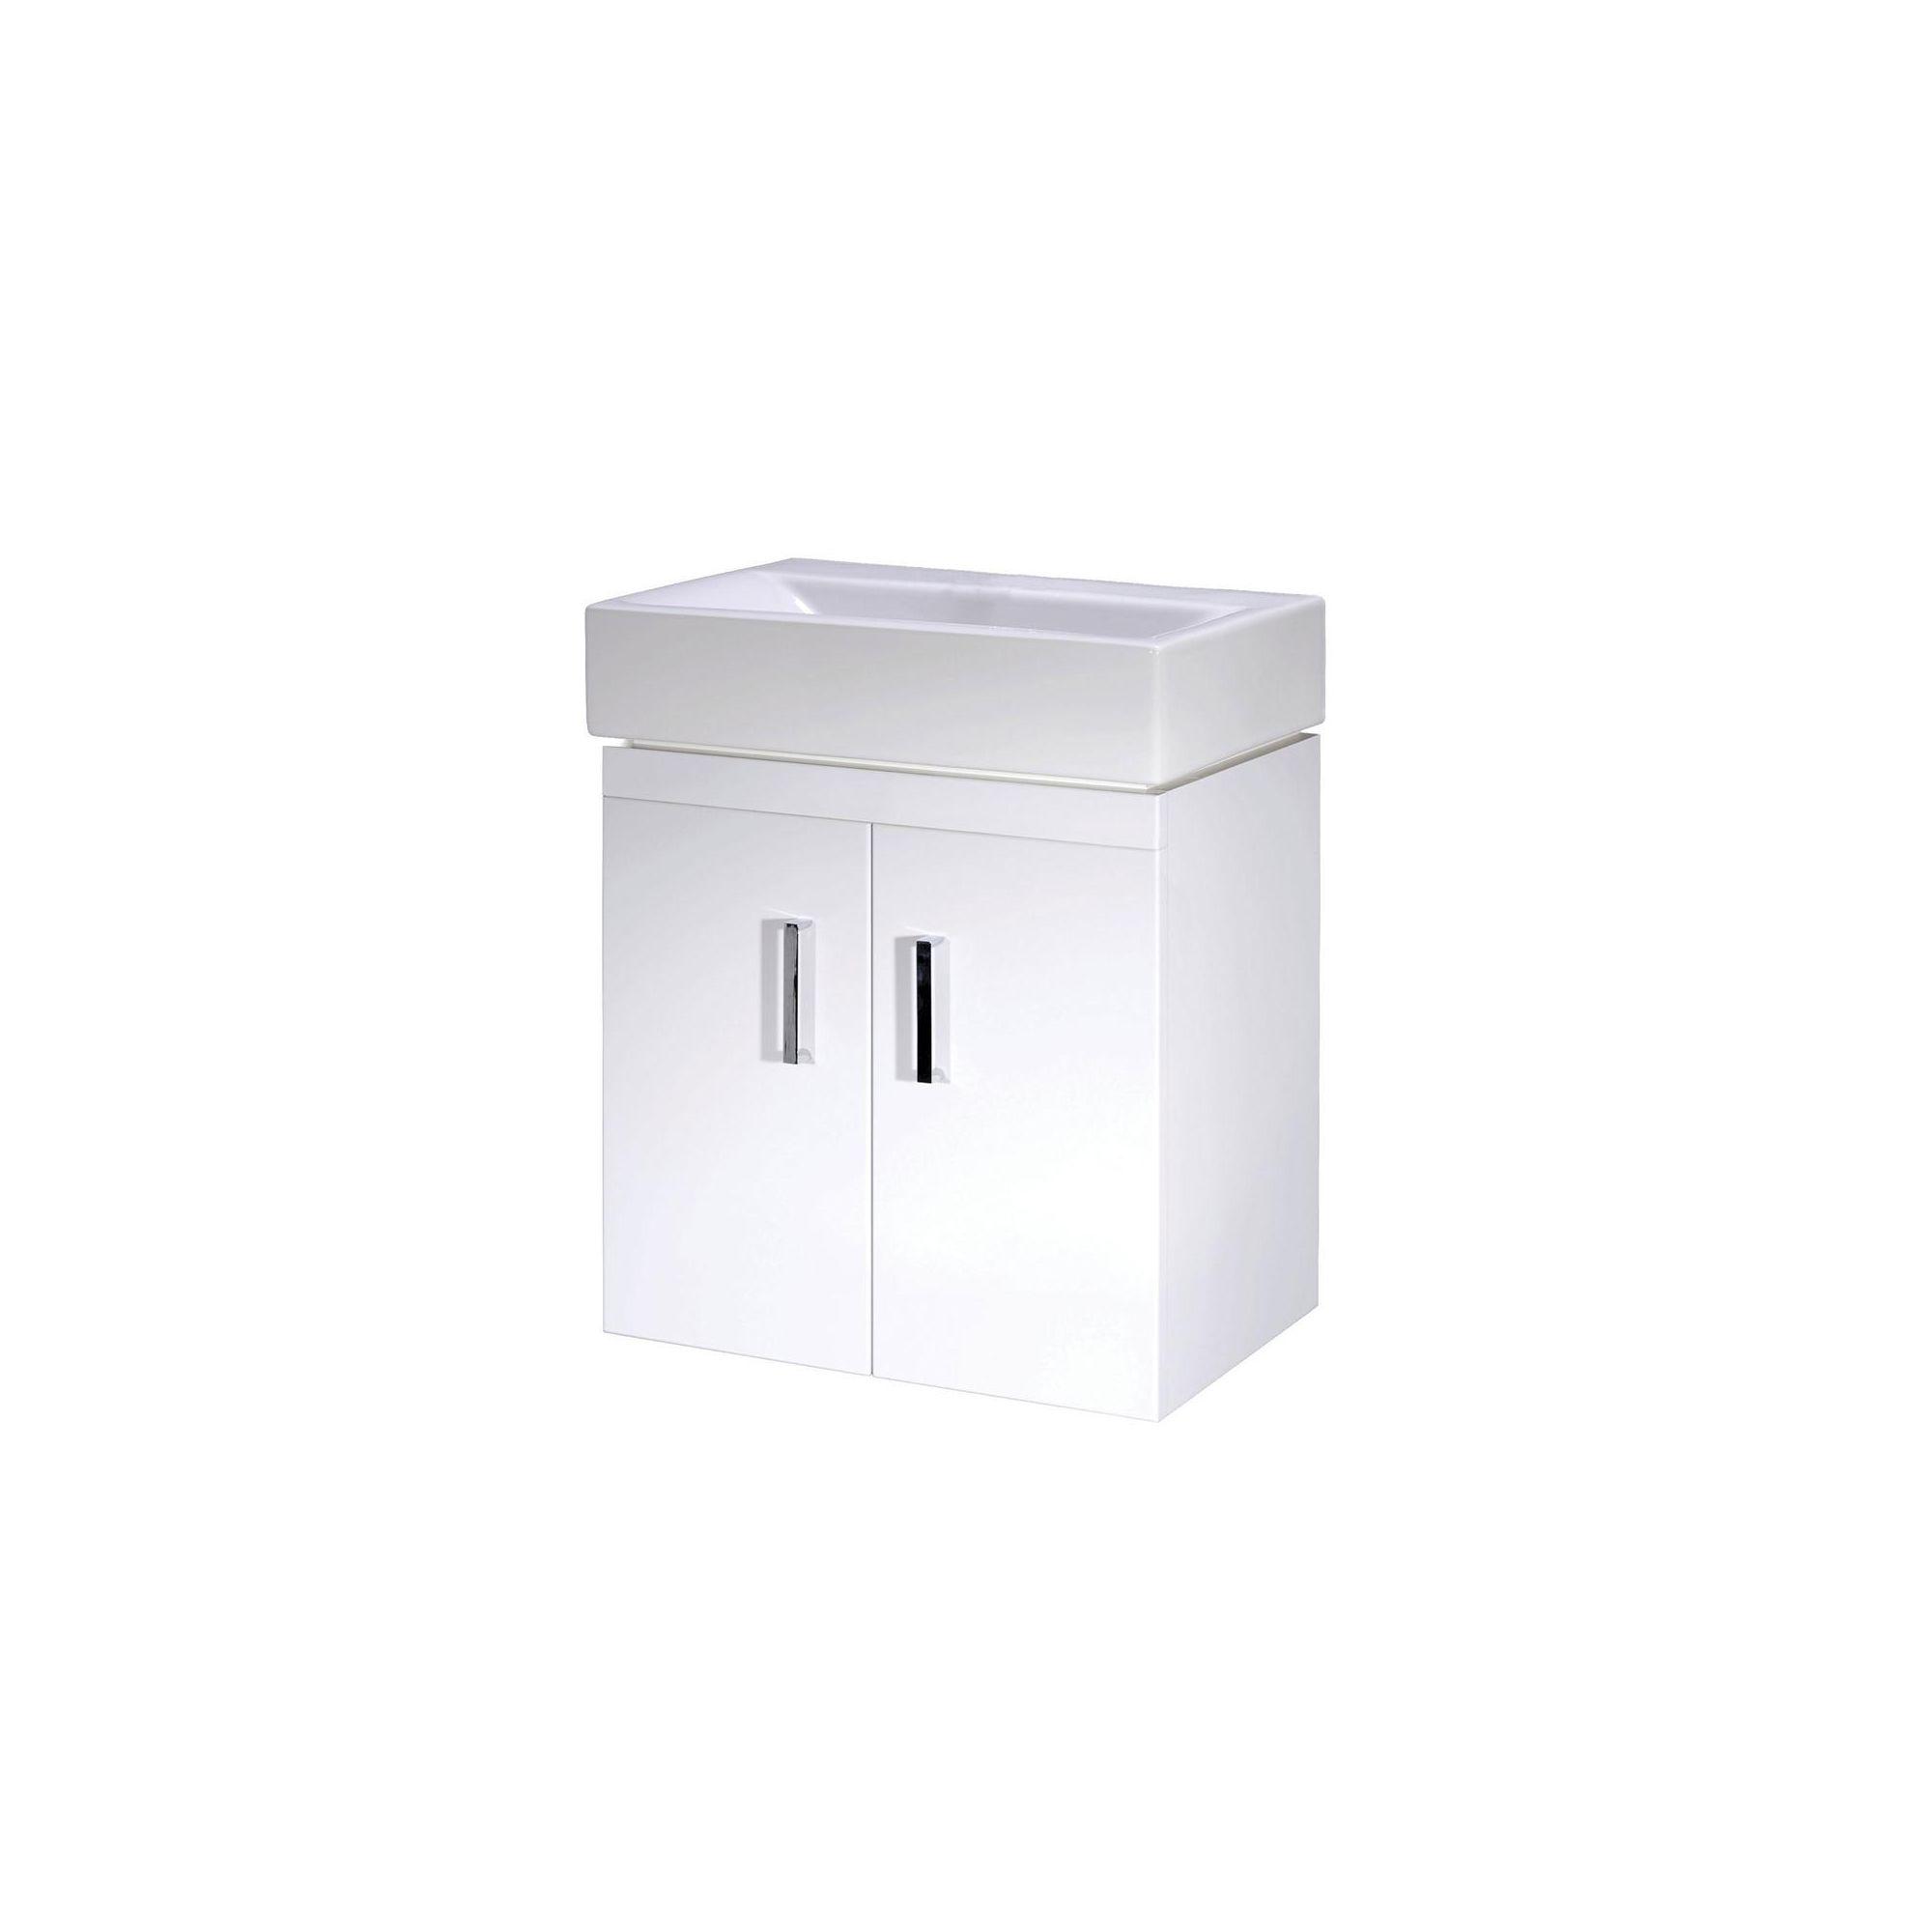 Premier Checkers Minimalist Wall Mounted Basin Vanity Unit White 450mm Deep